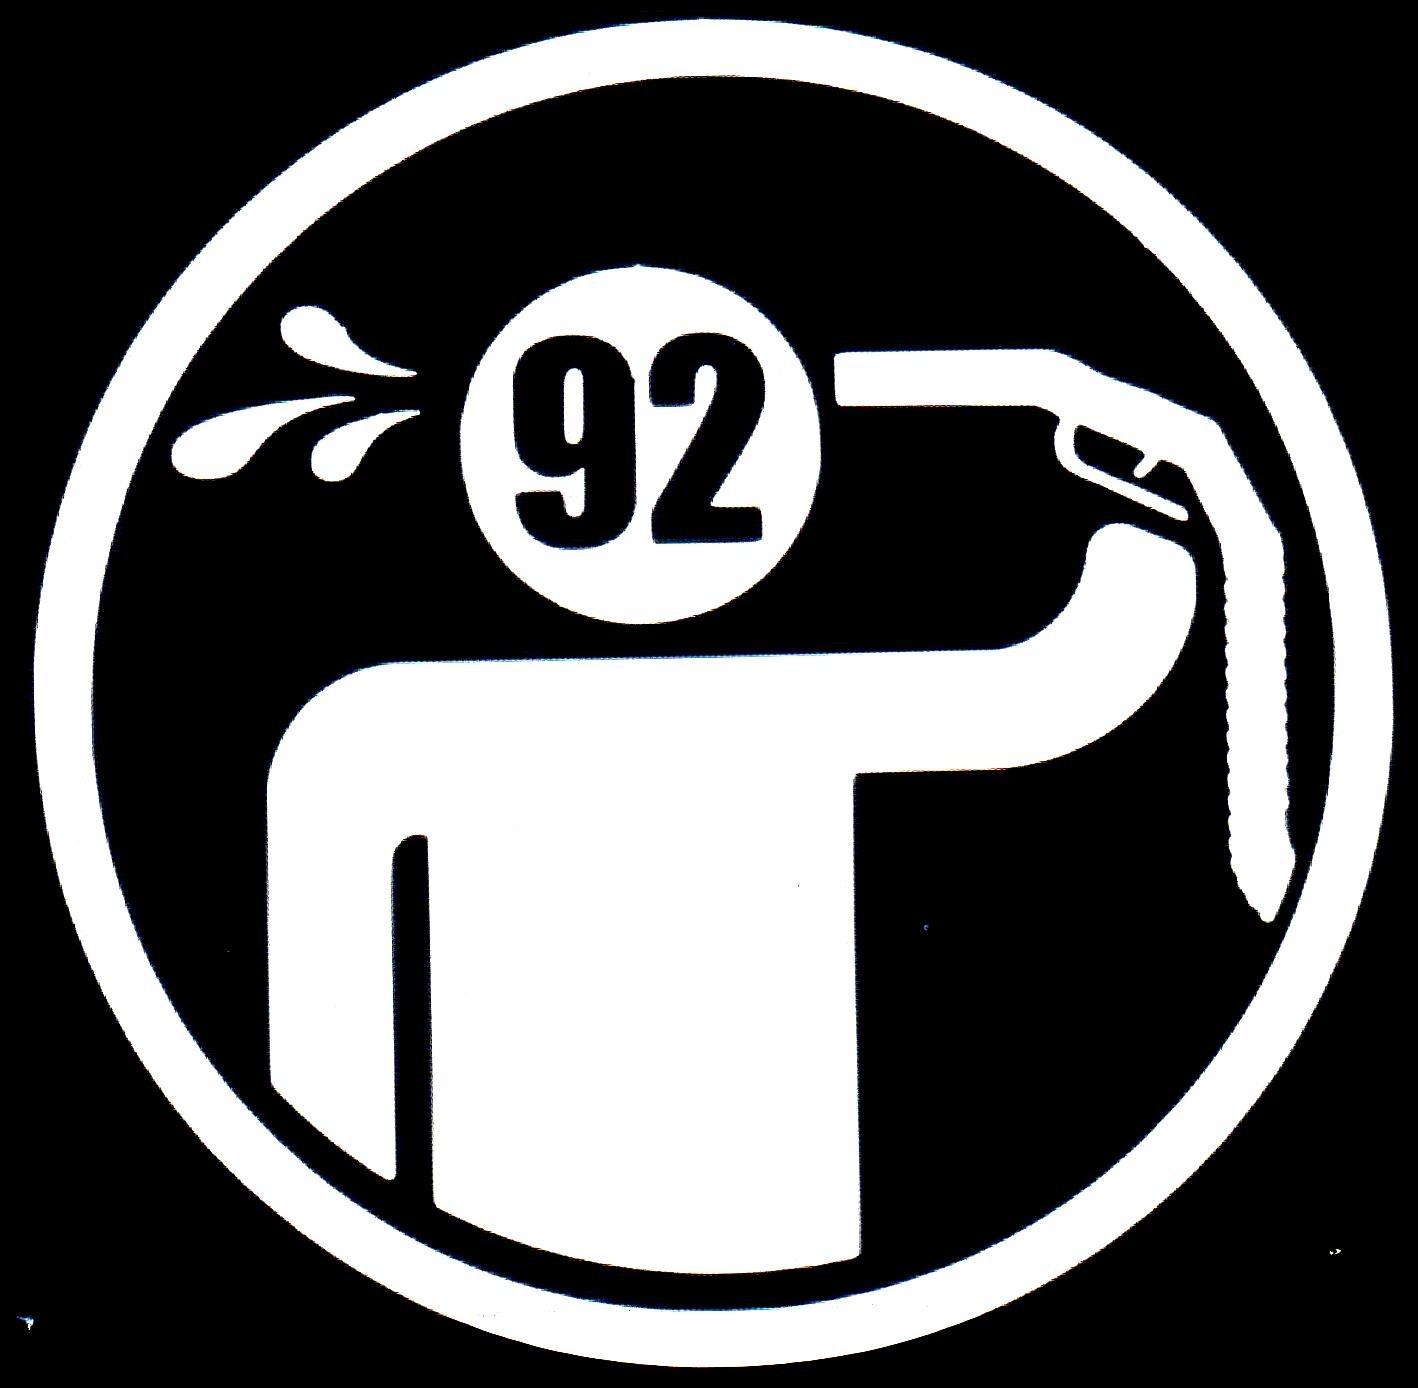 Наклейка автомобильная Mashinokom Цена АИ-92, VRC 015-11, 11,5*11,5 см наклейка автомобильная mashinokom внимание дети vrc 431 03 винил 10х12 см